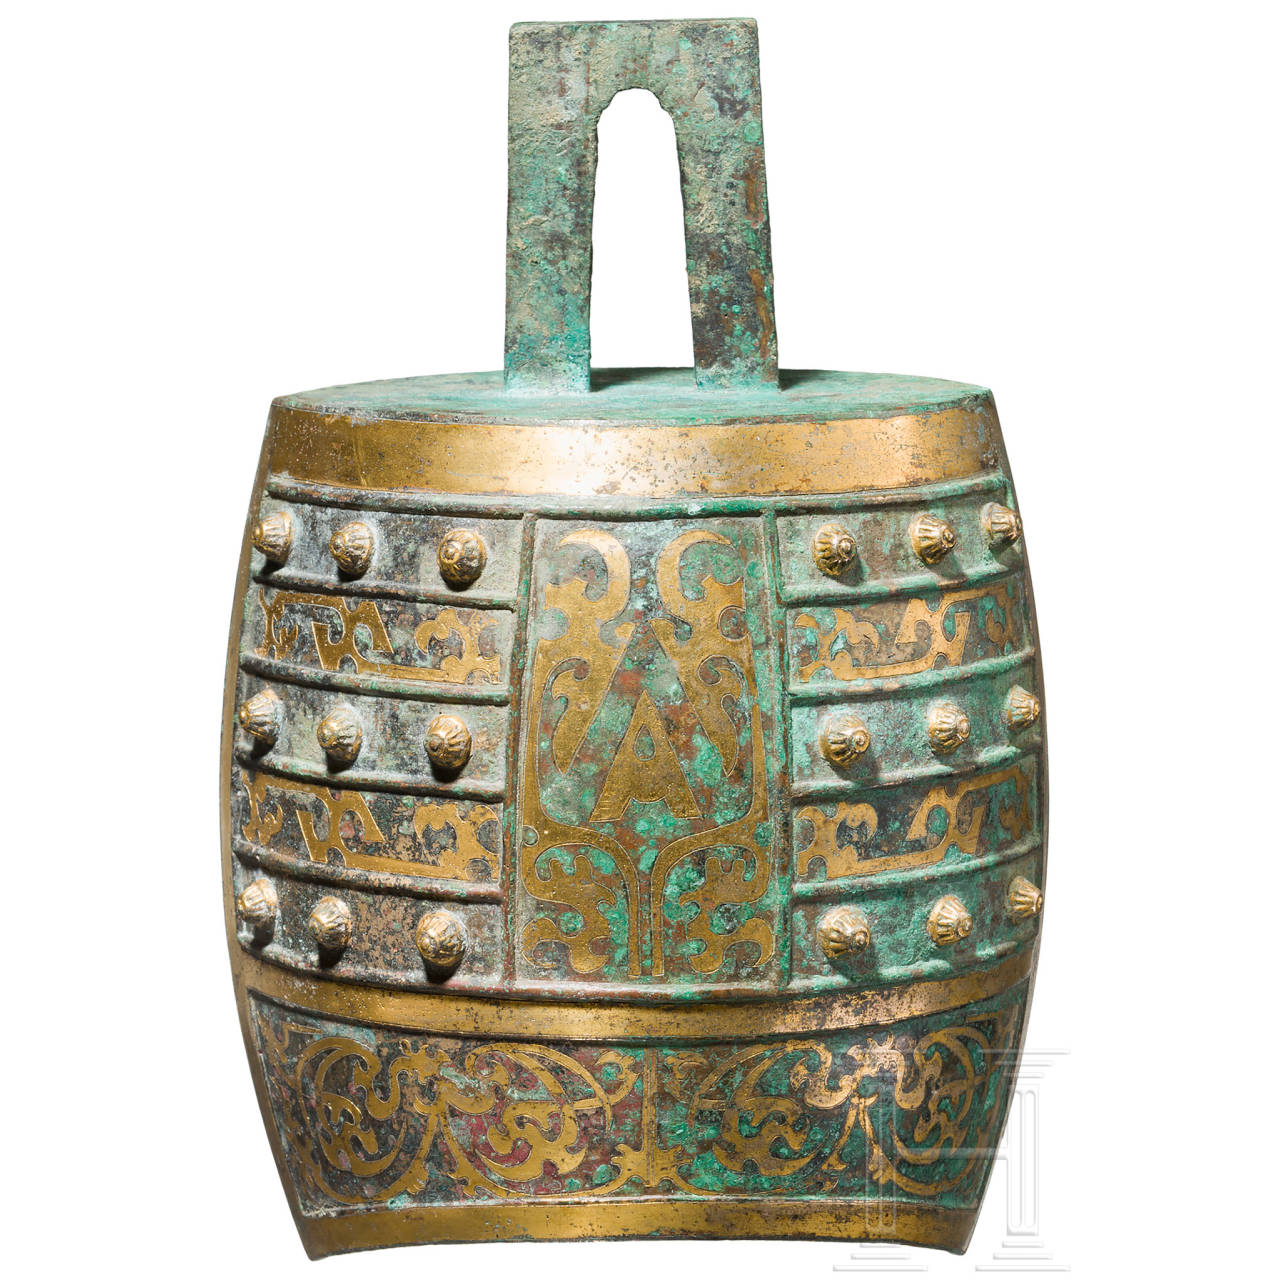 Bronzeglocke (Zhong) mit ornamentaler Vergoldung, China, Qin-Dynastie, 3. Jhdt. v. Chr.